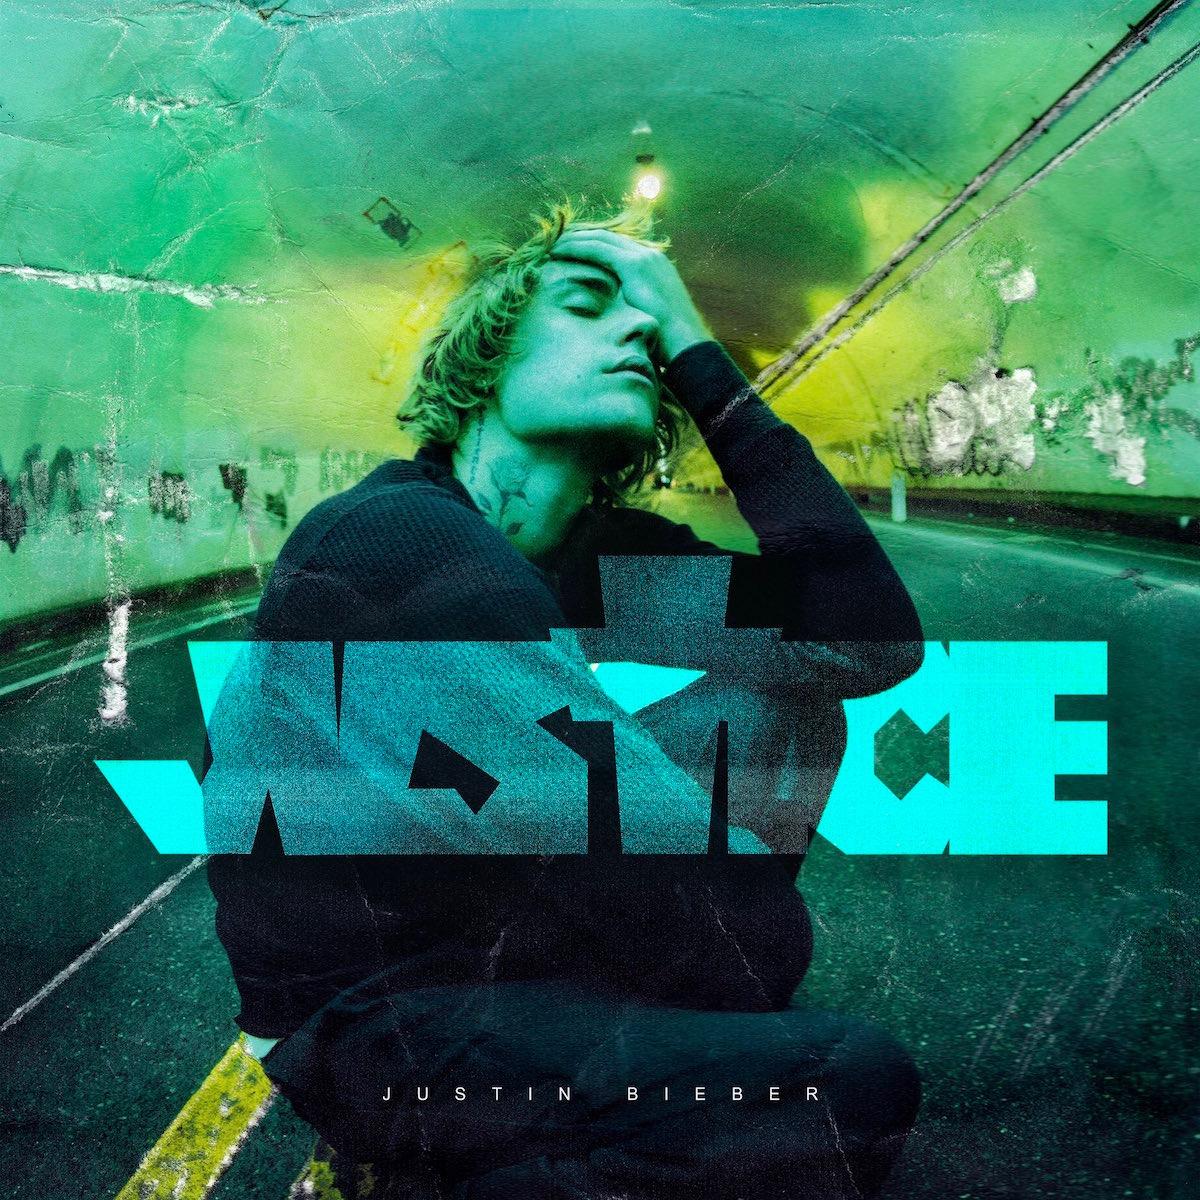 Justin Bieber – Justice